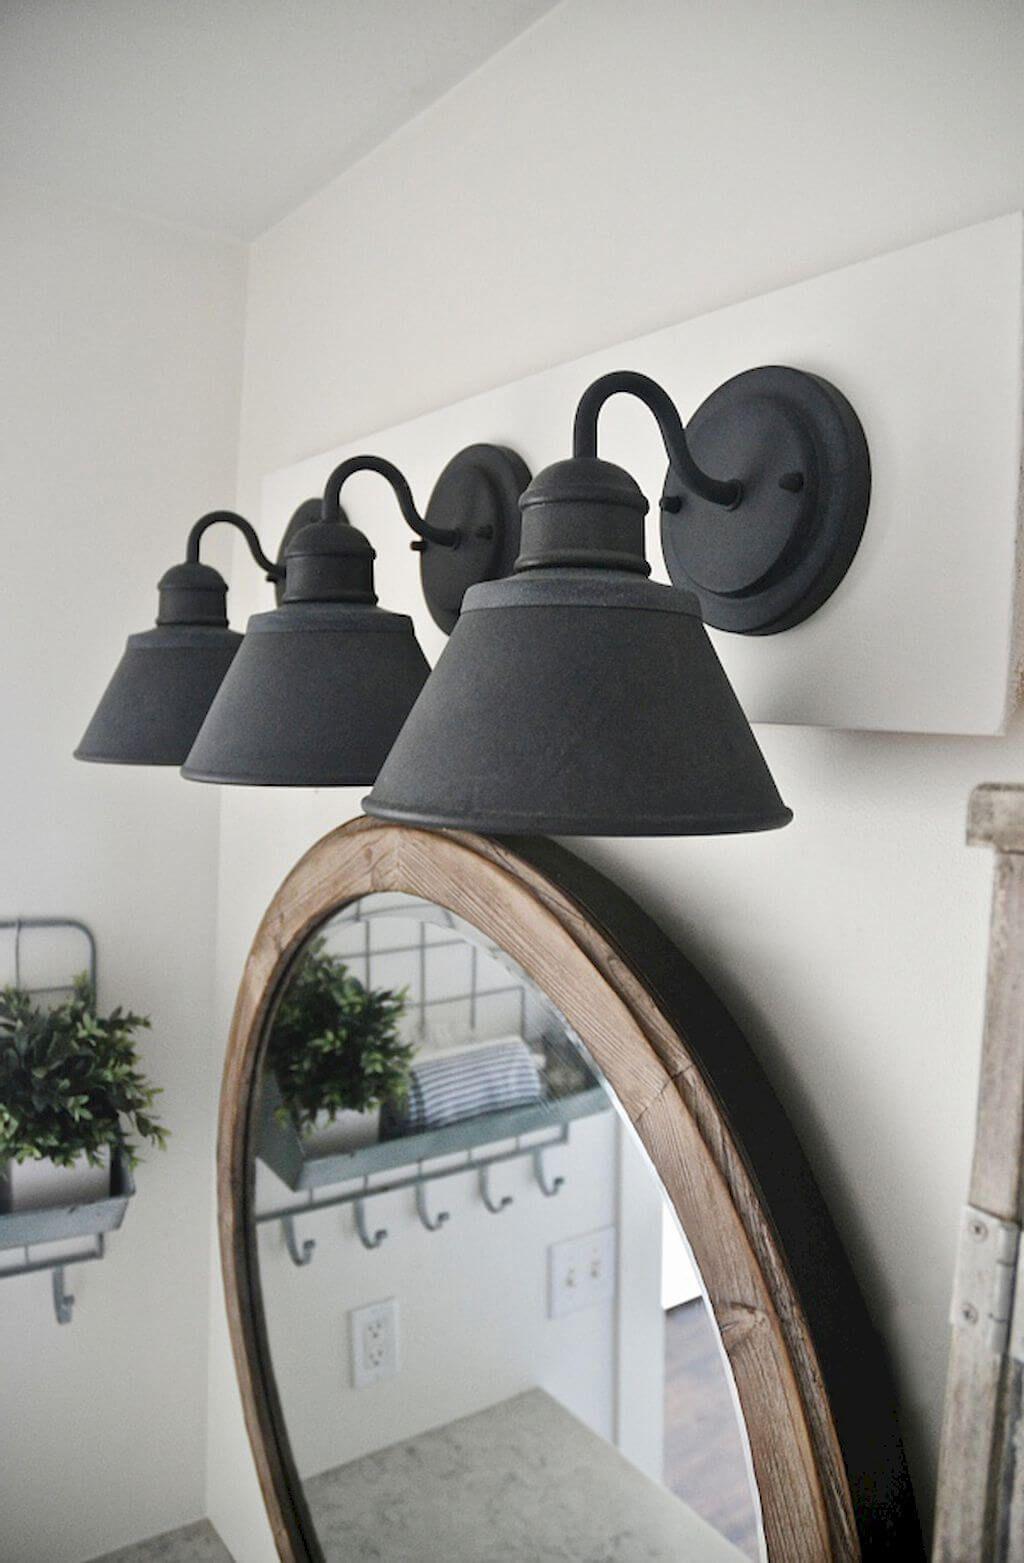 Matte Black Gooseneck Light Post Bathroom Fixture Light